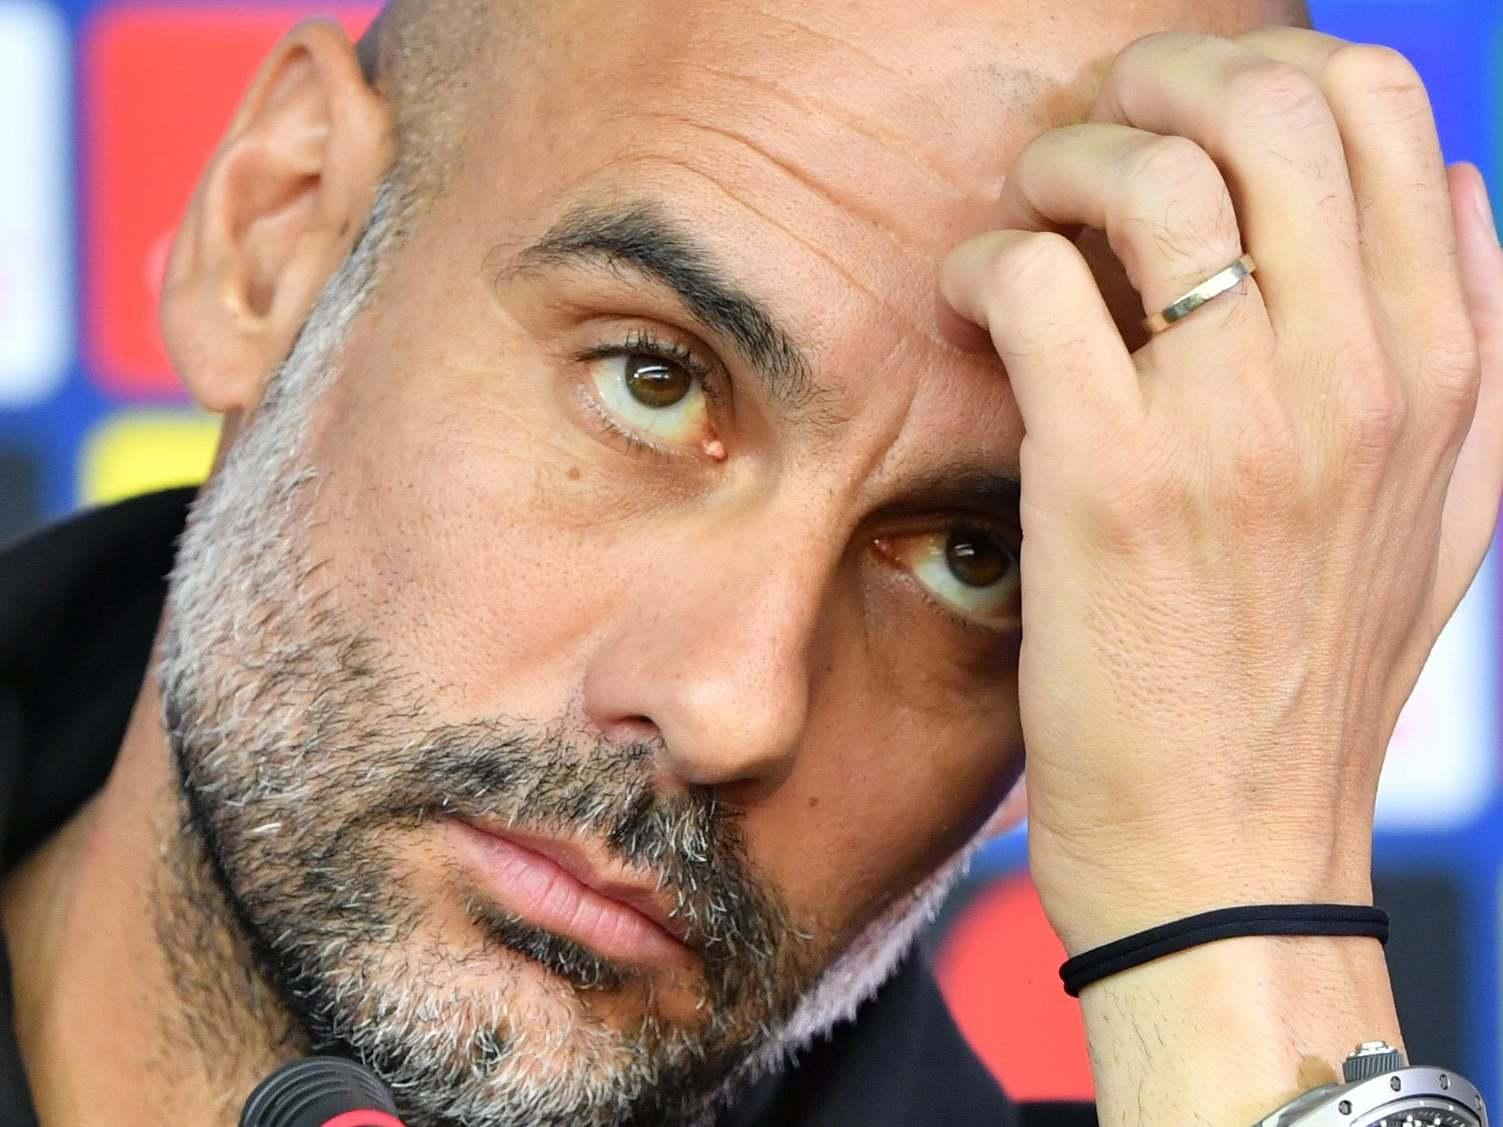 Man City: Pep Guardiola relishing 'incredible challenge' of solving defensive crisis ahead of Shakhtar Donetsk match